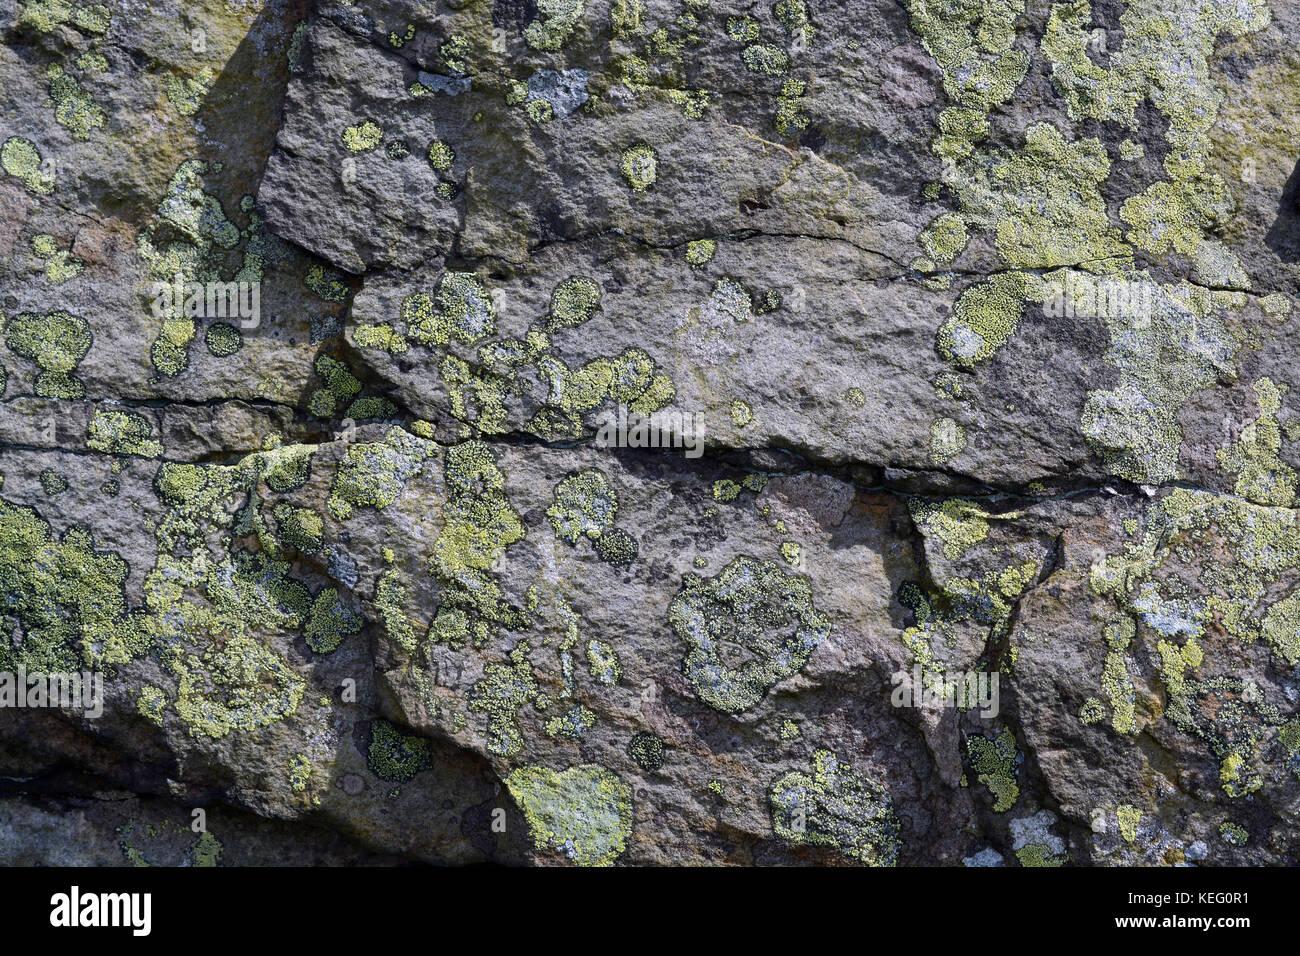 Lichen on Rocks, Northumberland - Stock Image